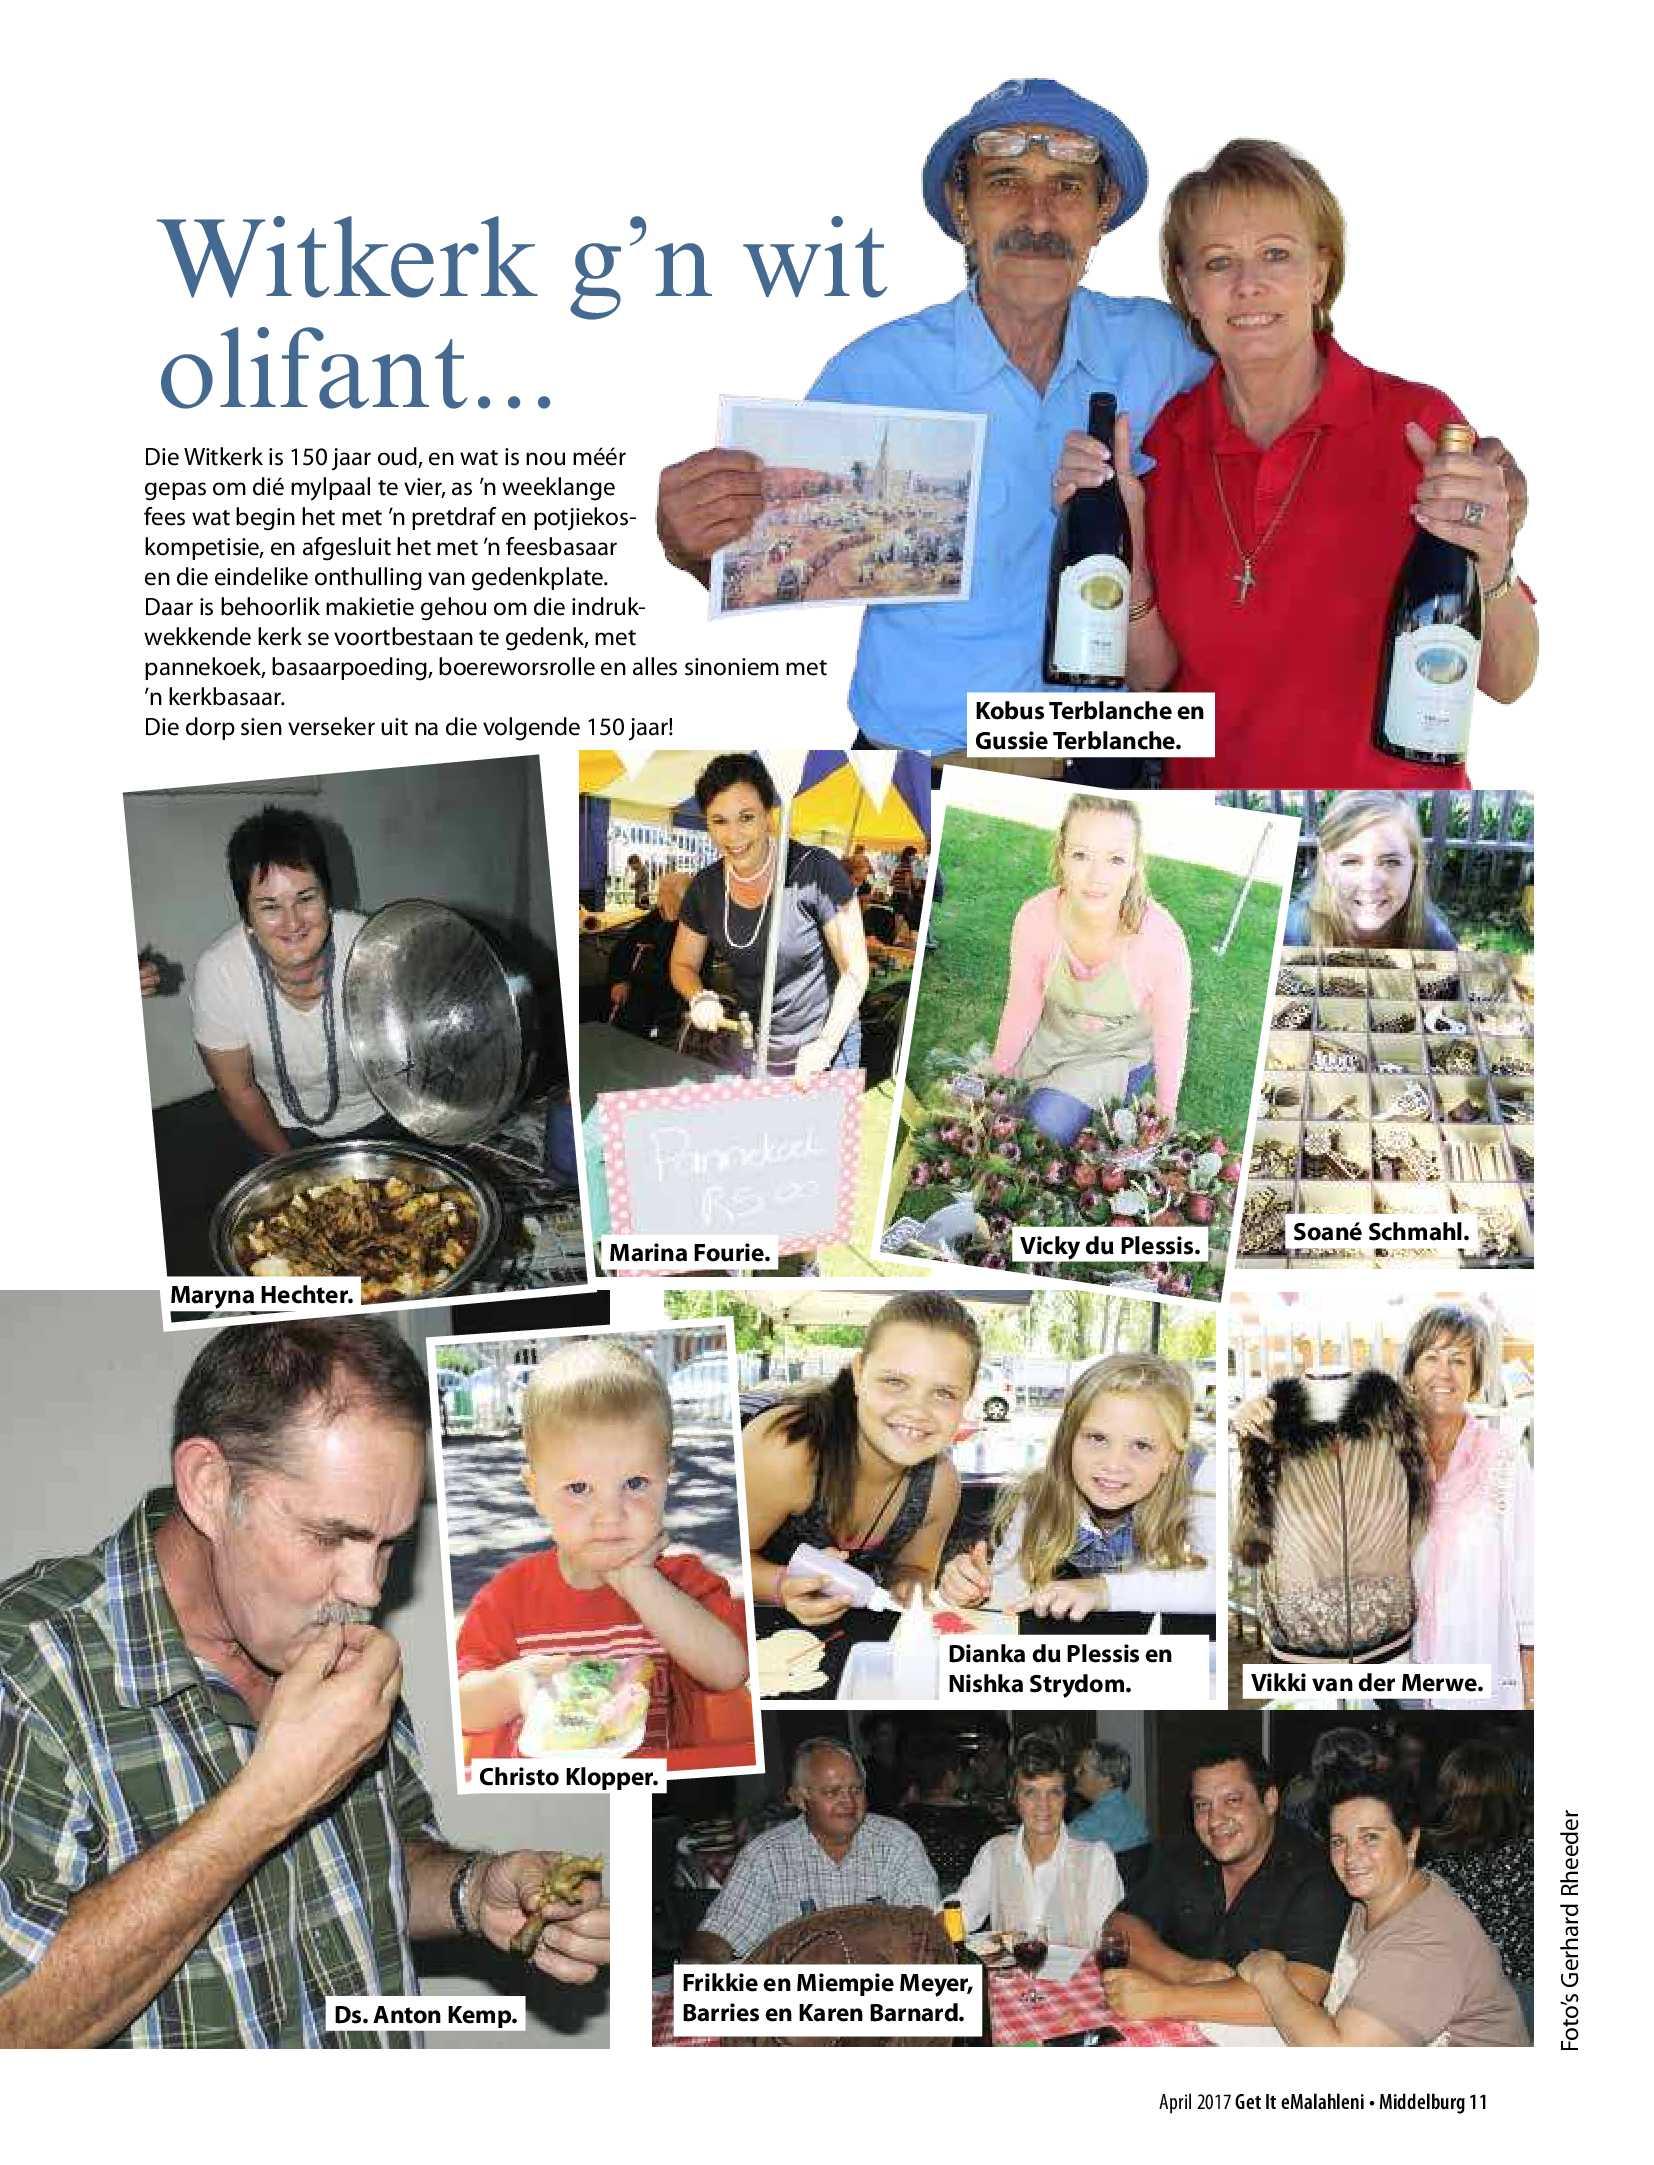 get-middelburg-april-2017-epapers-page-13